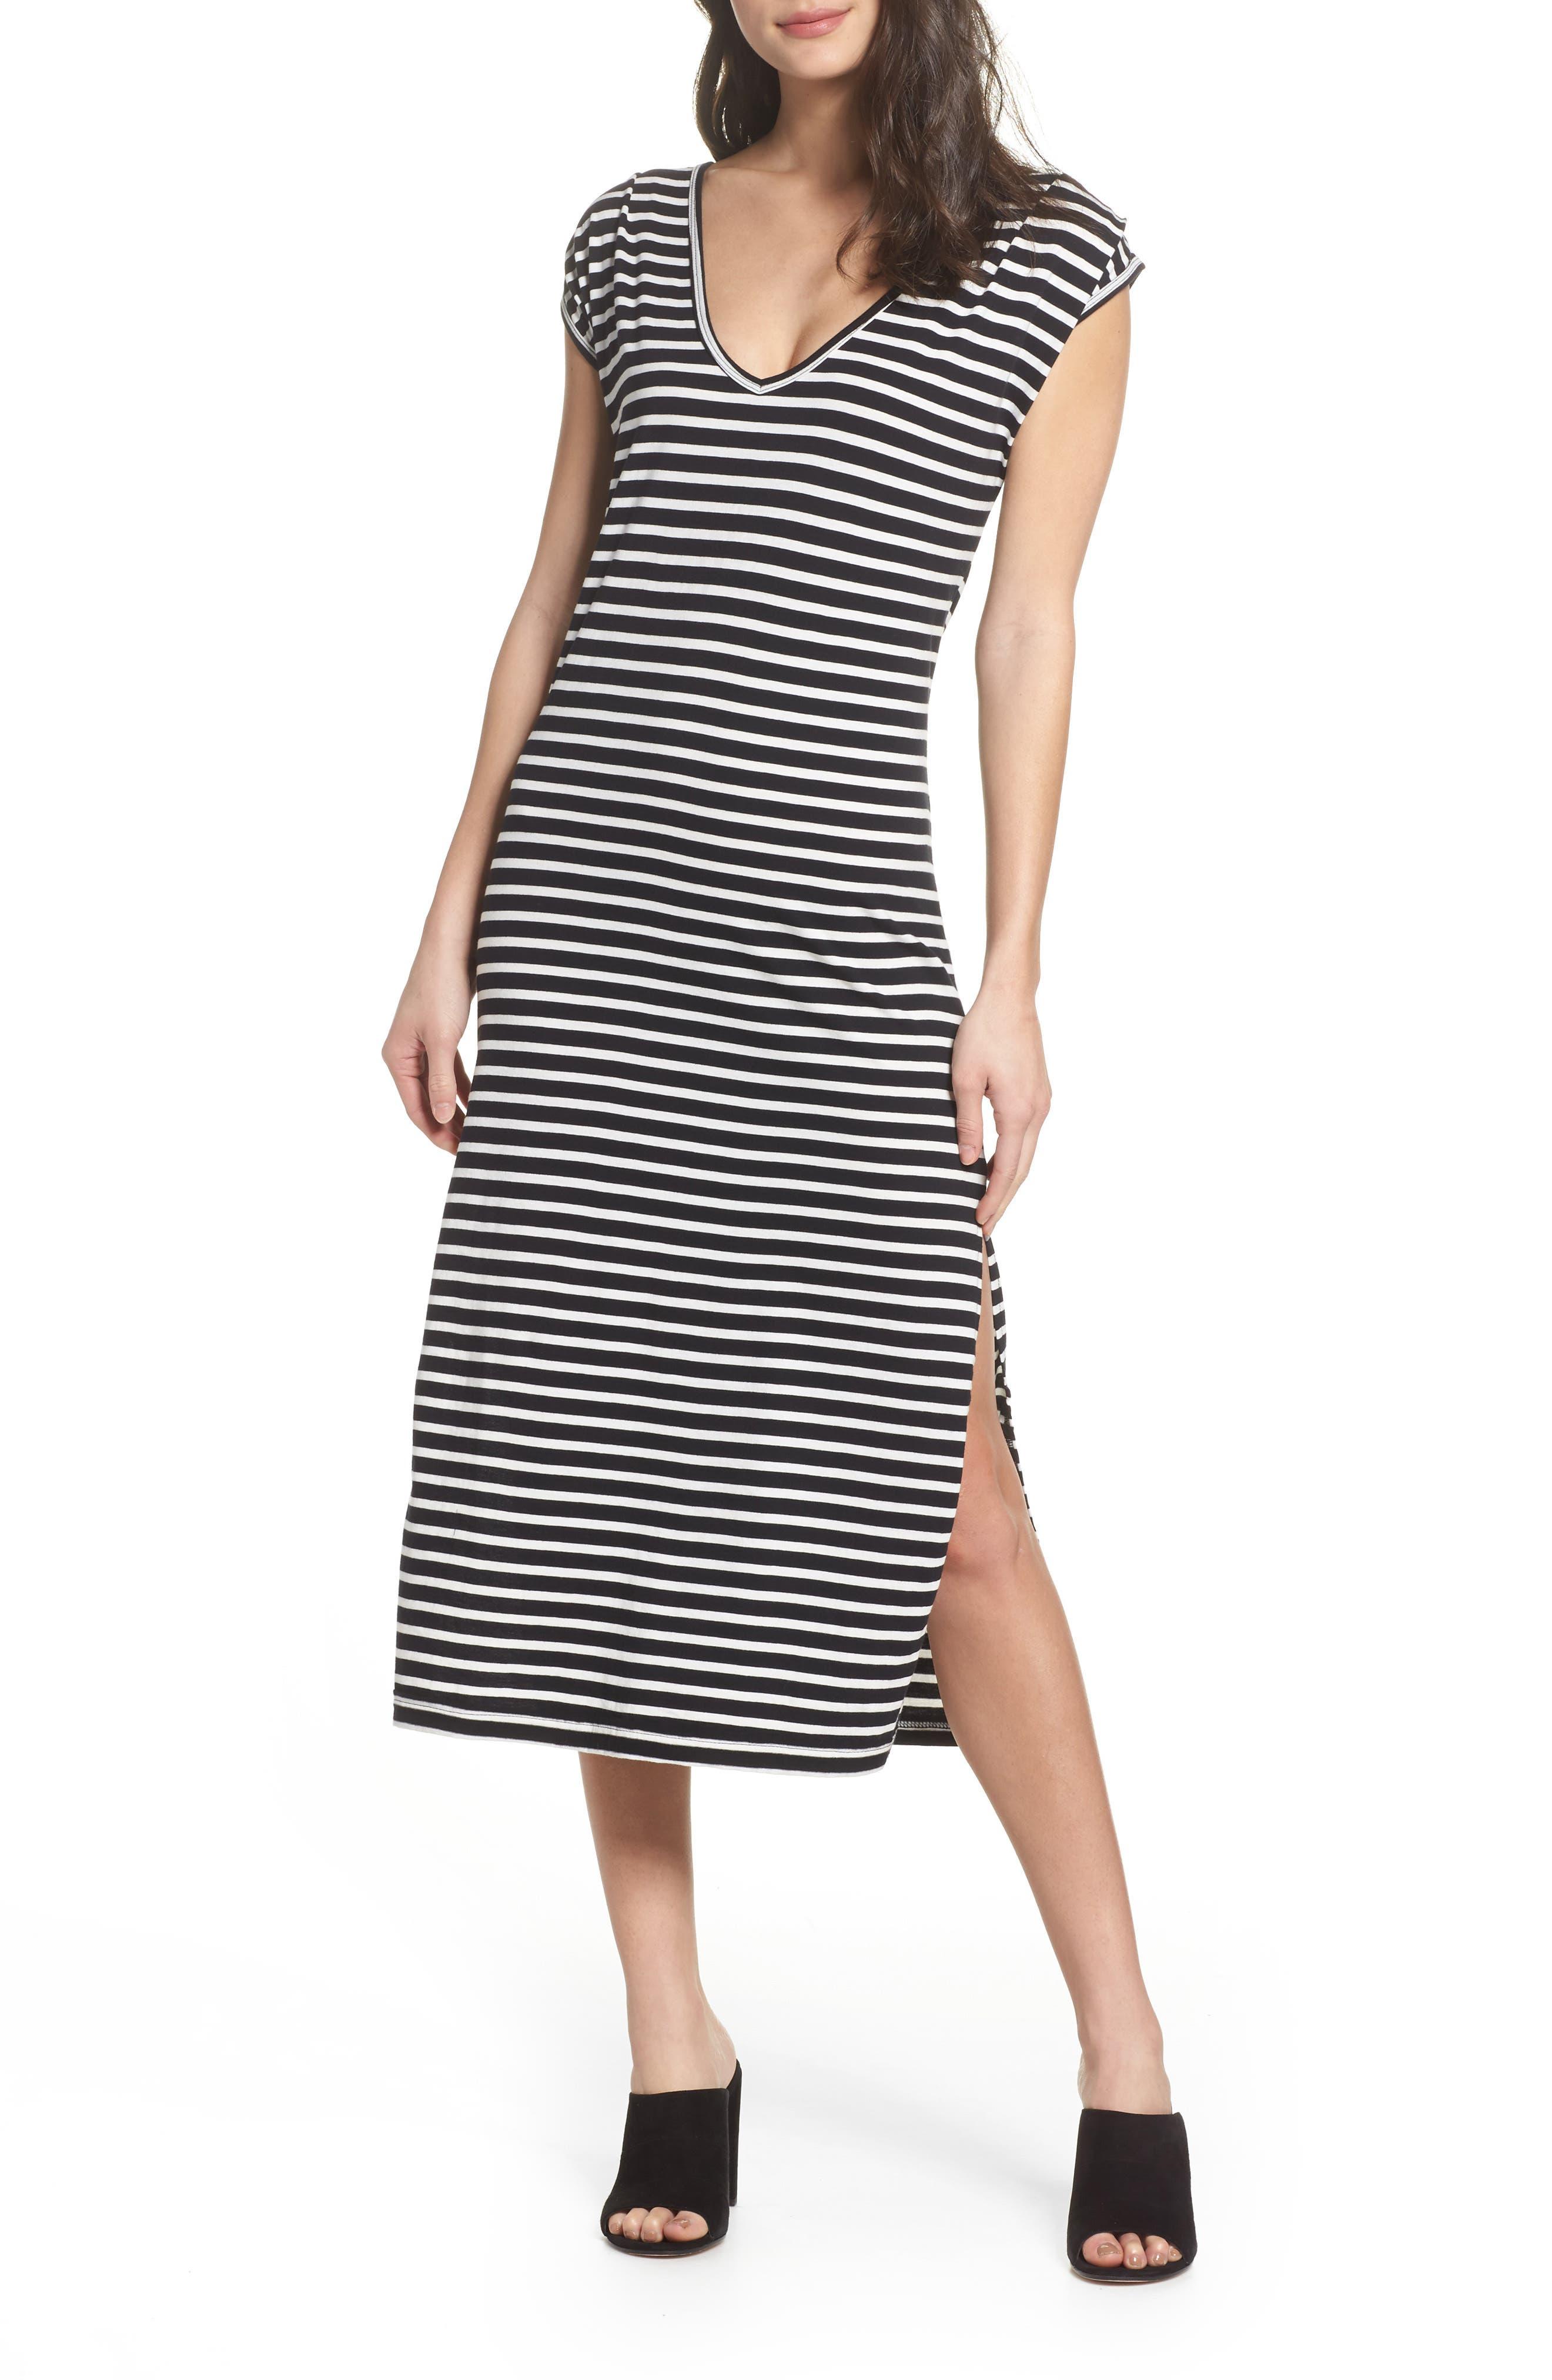 Solana Stripe Knit Midi Dress,                             Main thumbnail 1, color,                             Black White Stripe